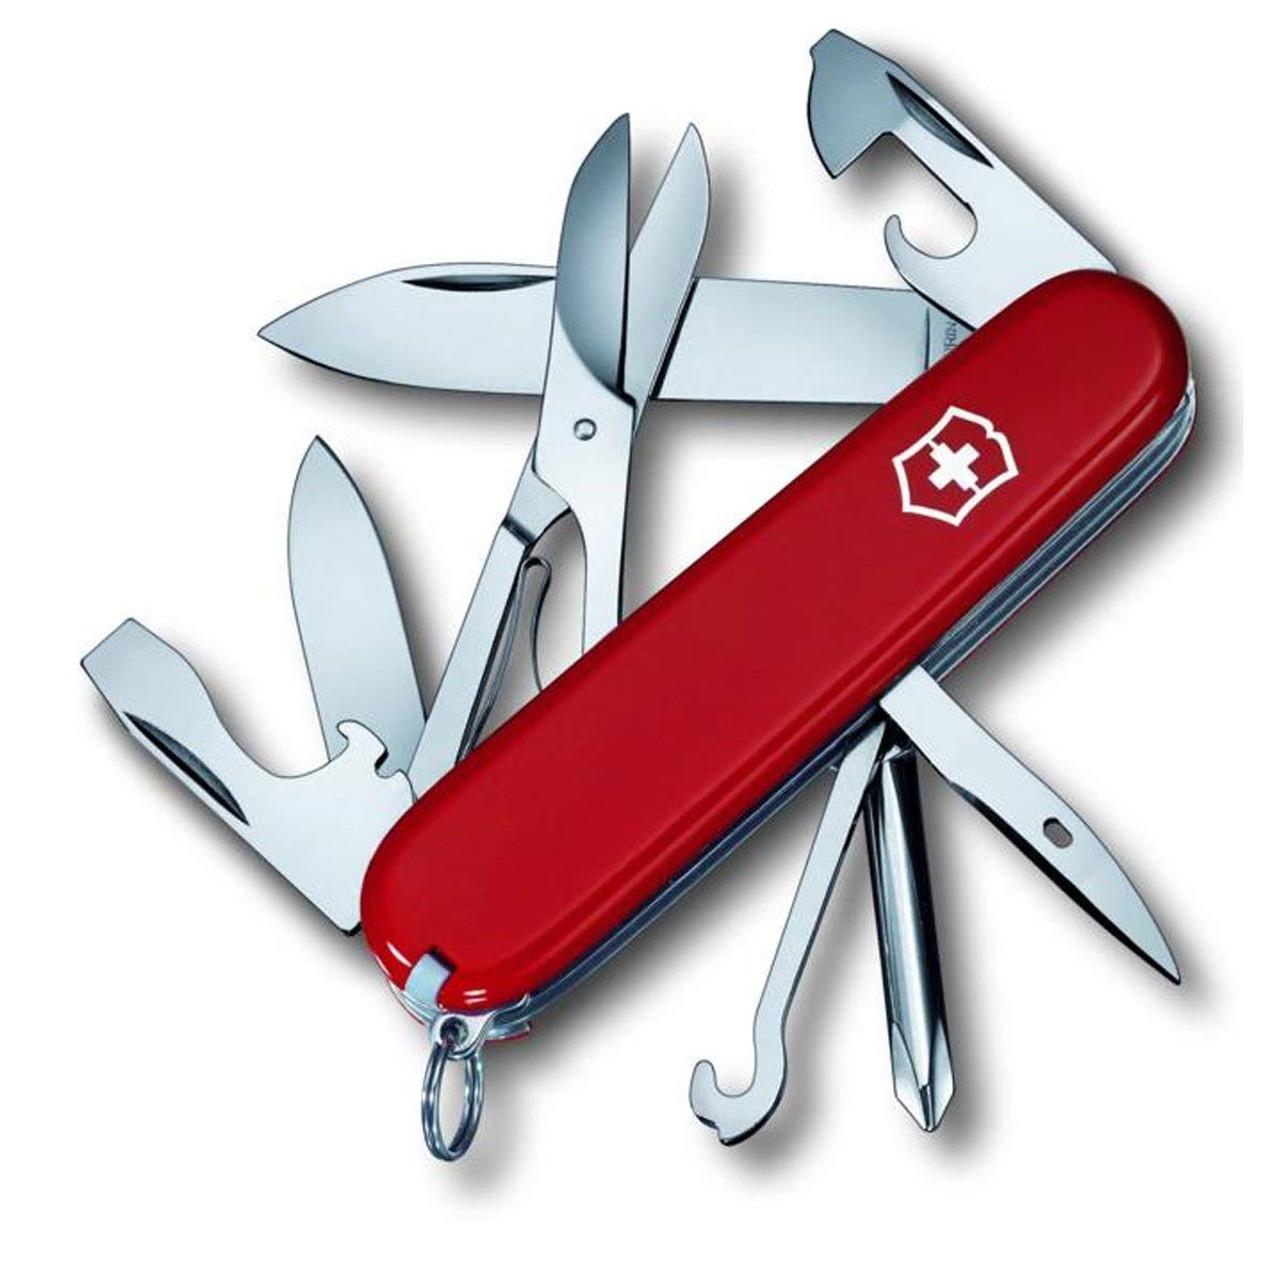 Victorinox Swiss Army Super Tinker Red - 53341